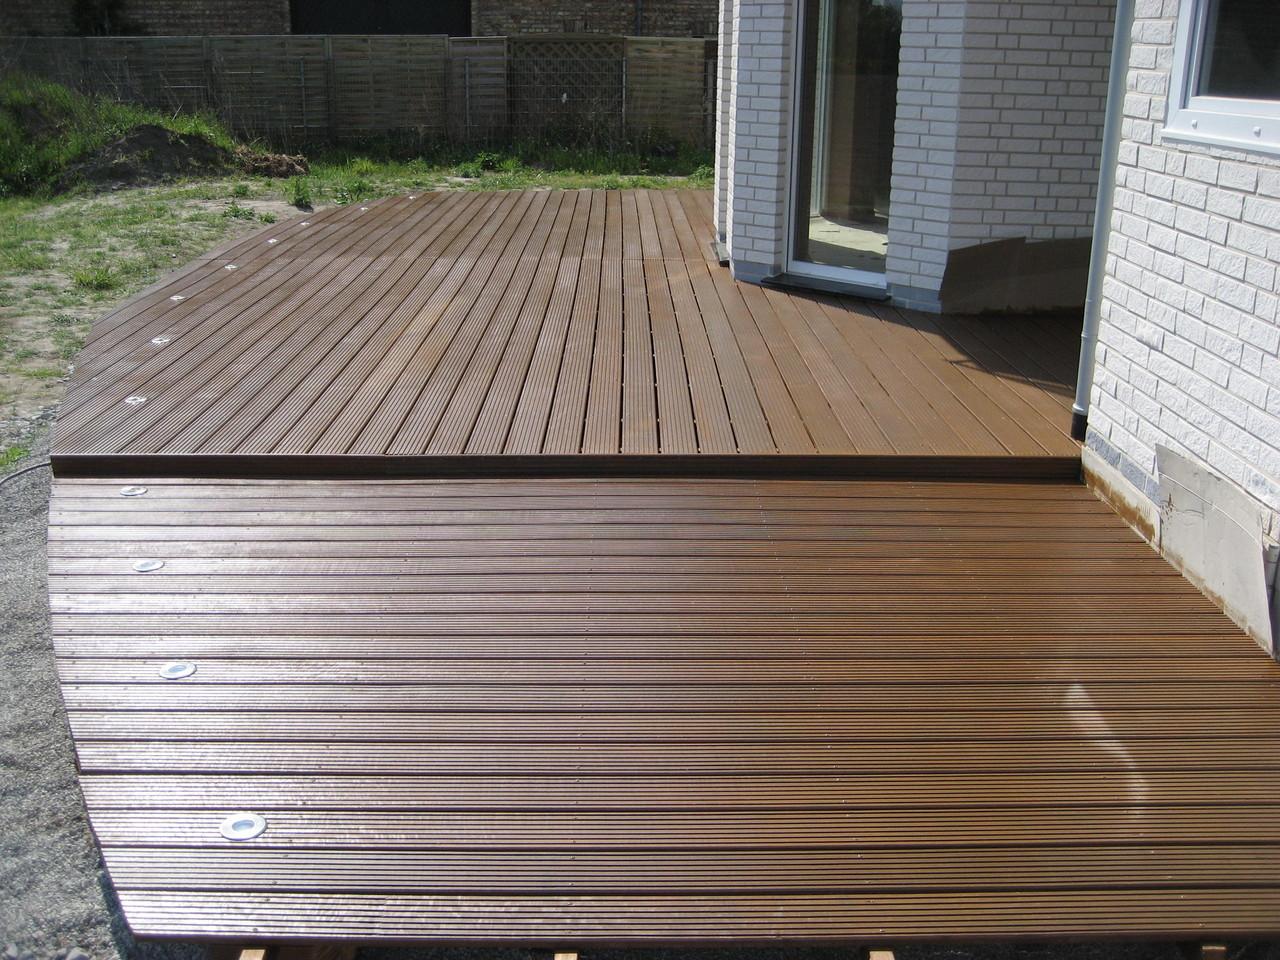 Terrasse mit Massaranduba - Dielen